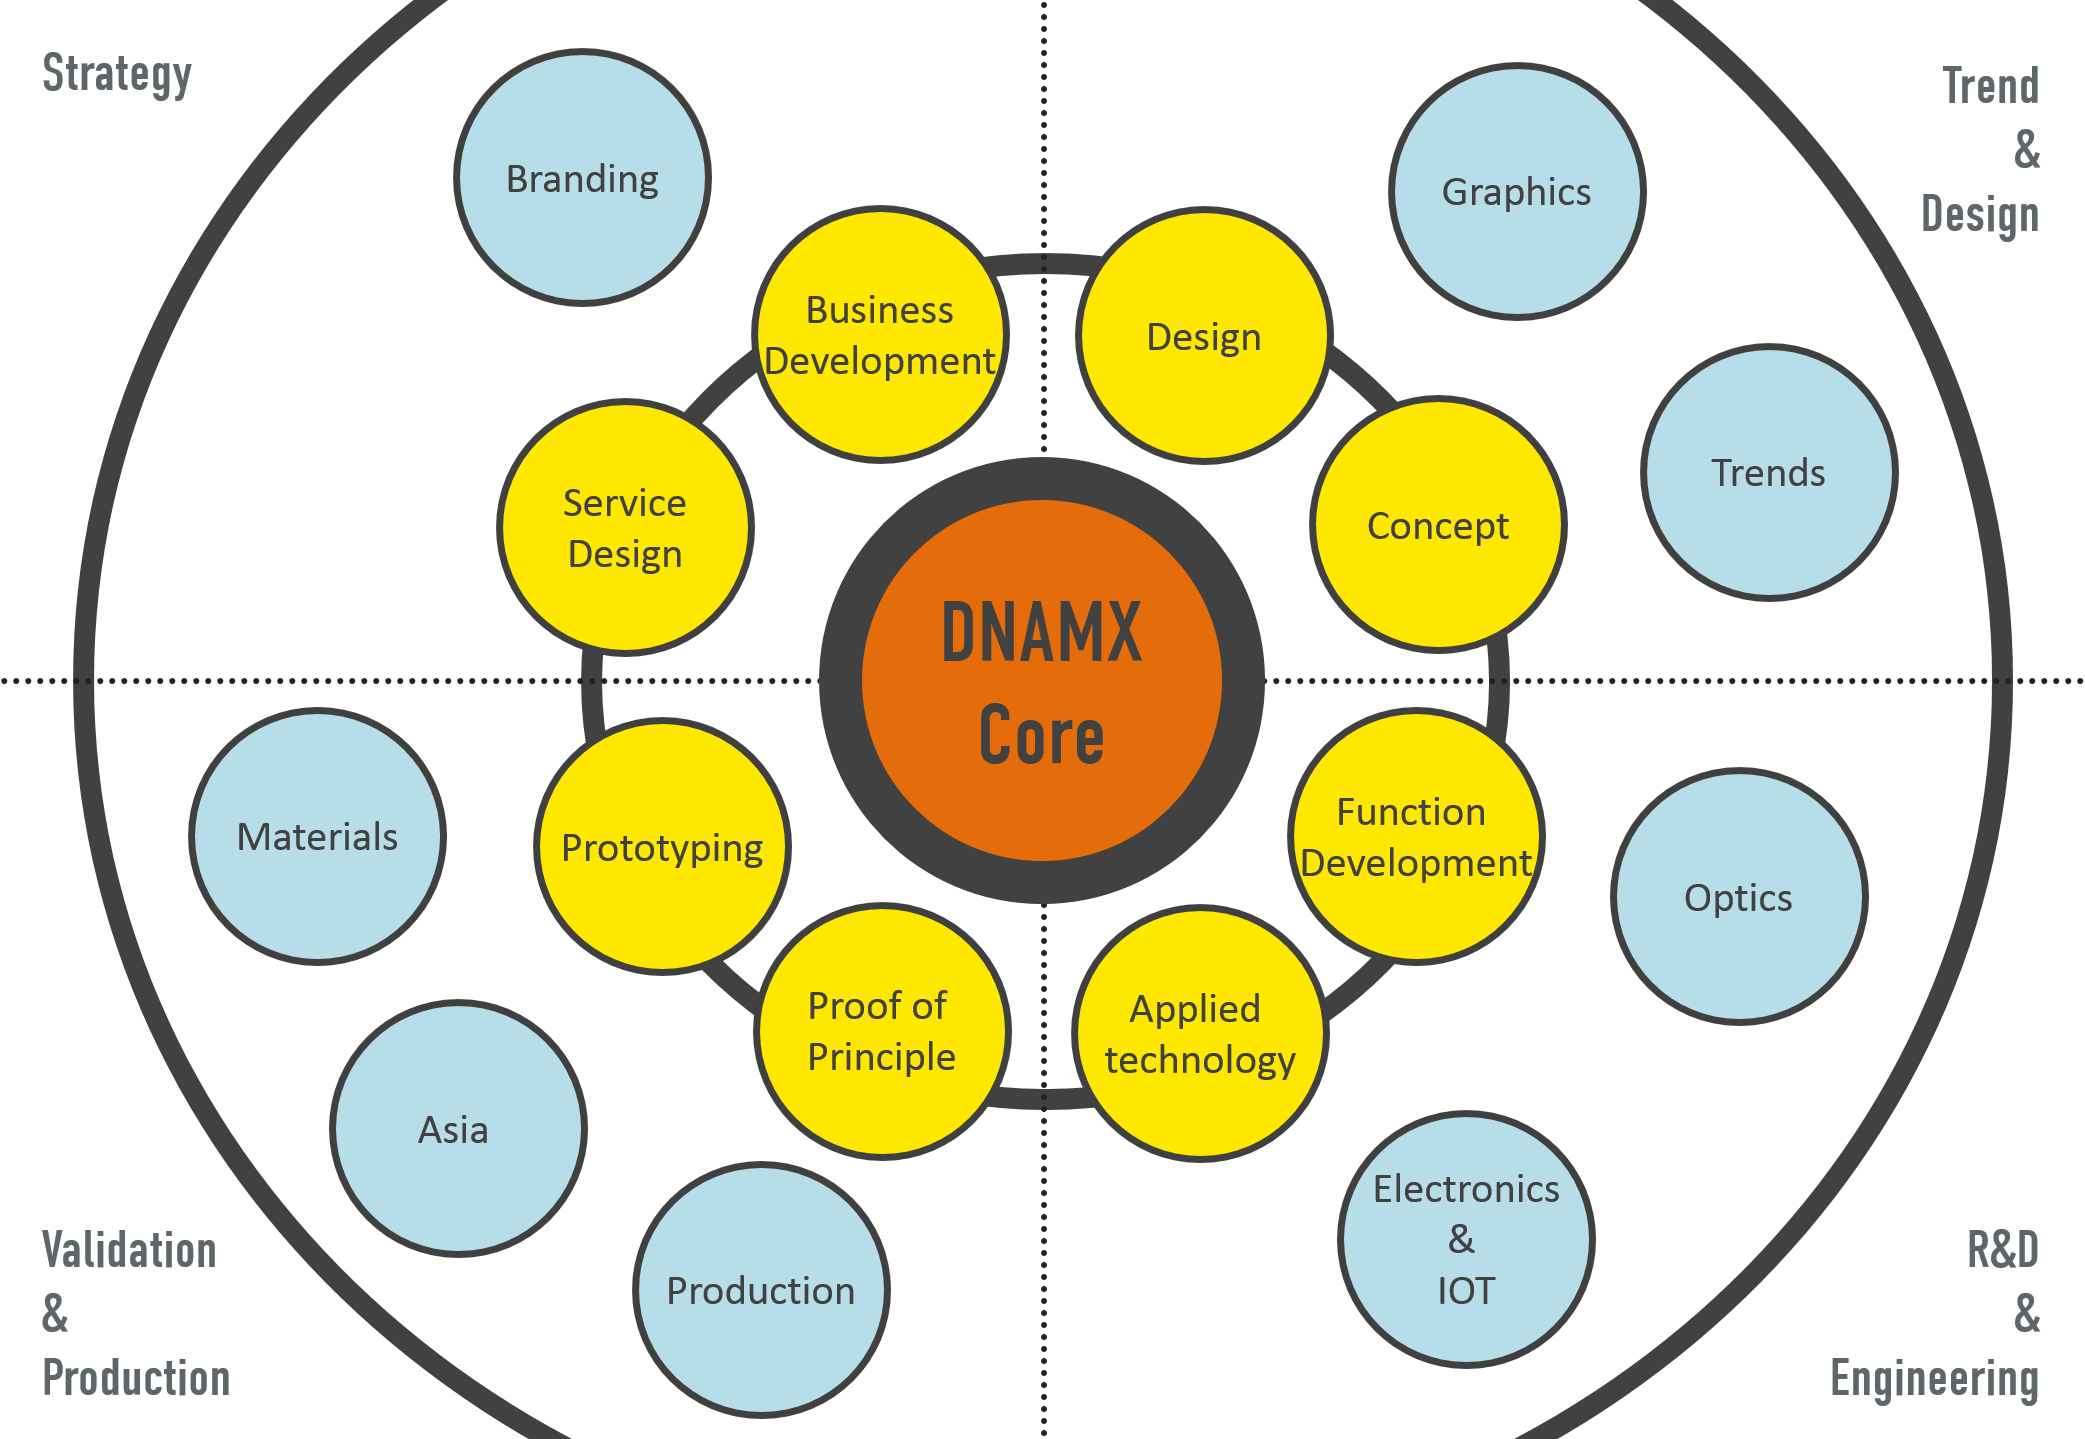 DNAMX Network